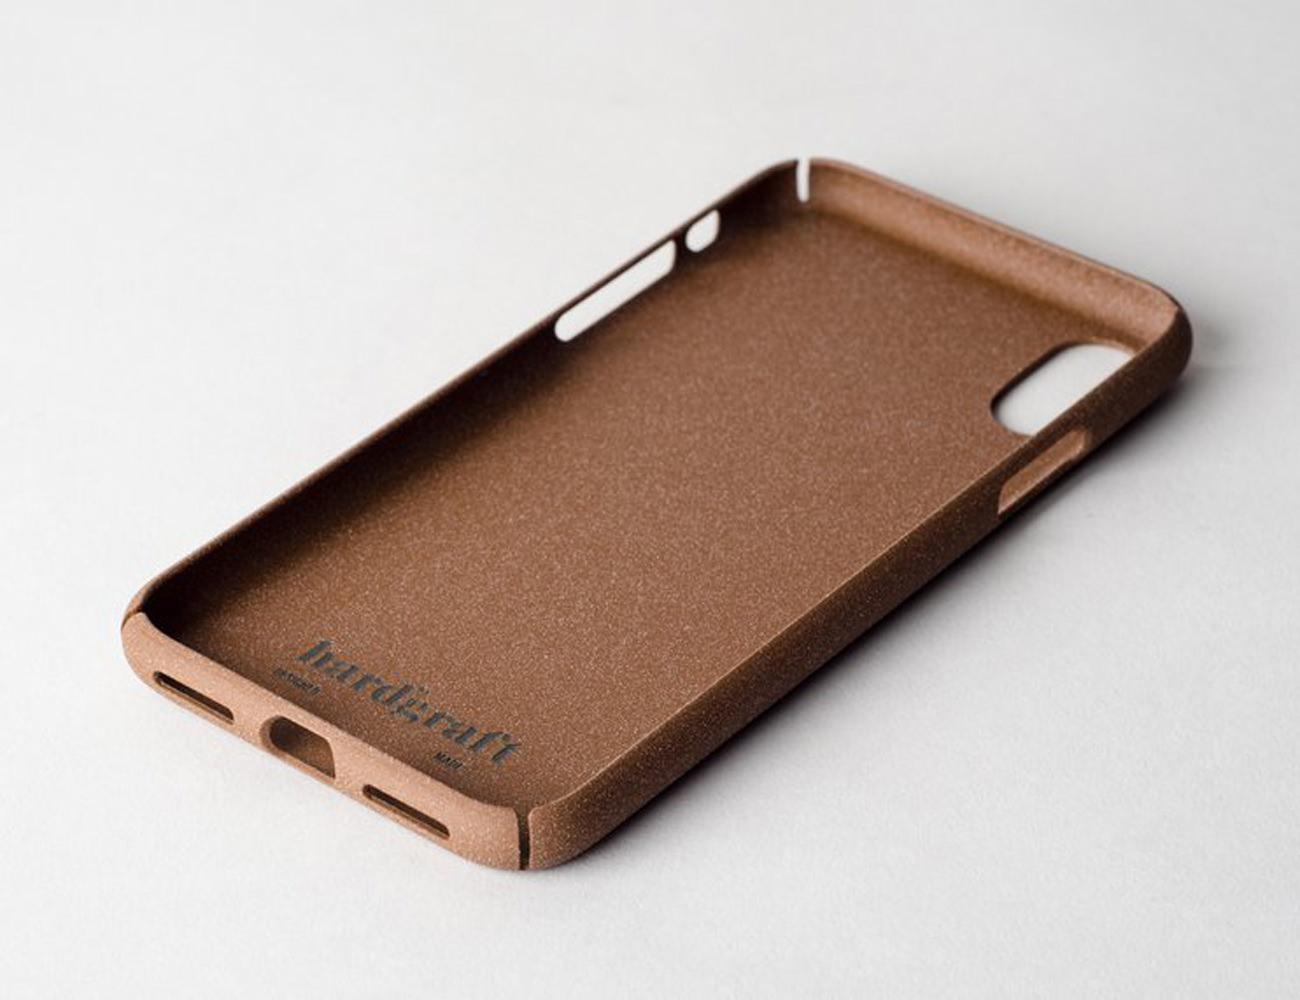 hardgraft Full On Grainy iPhone X Case